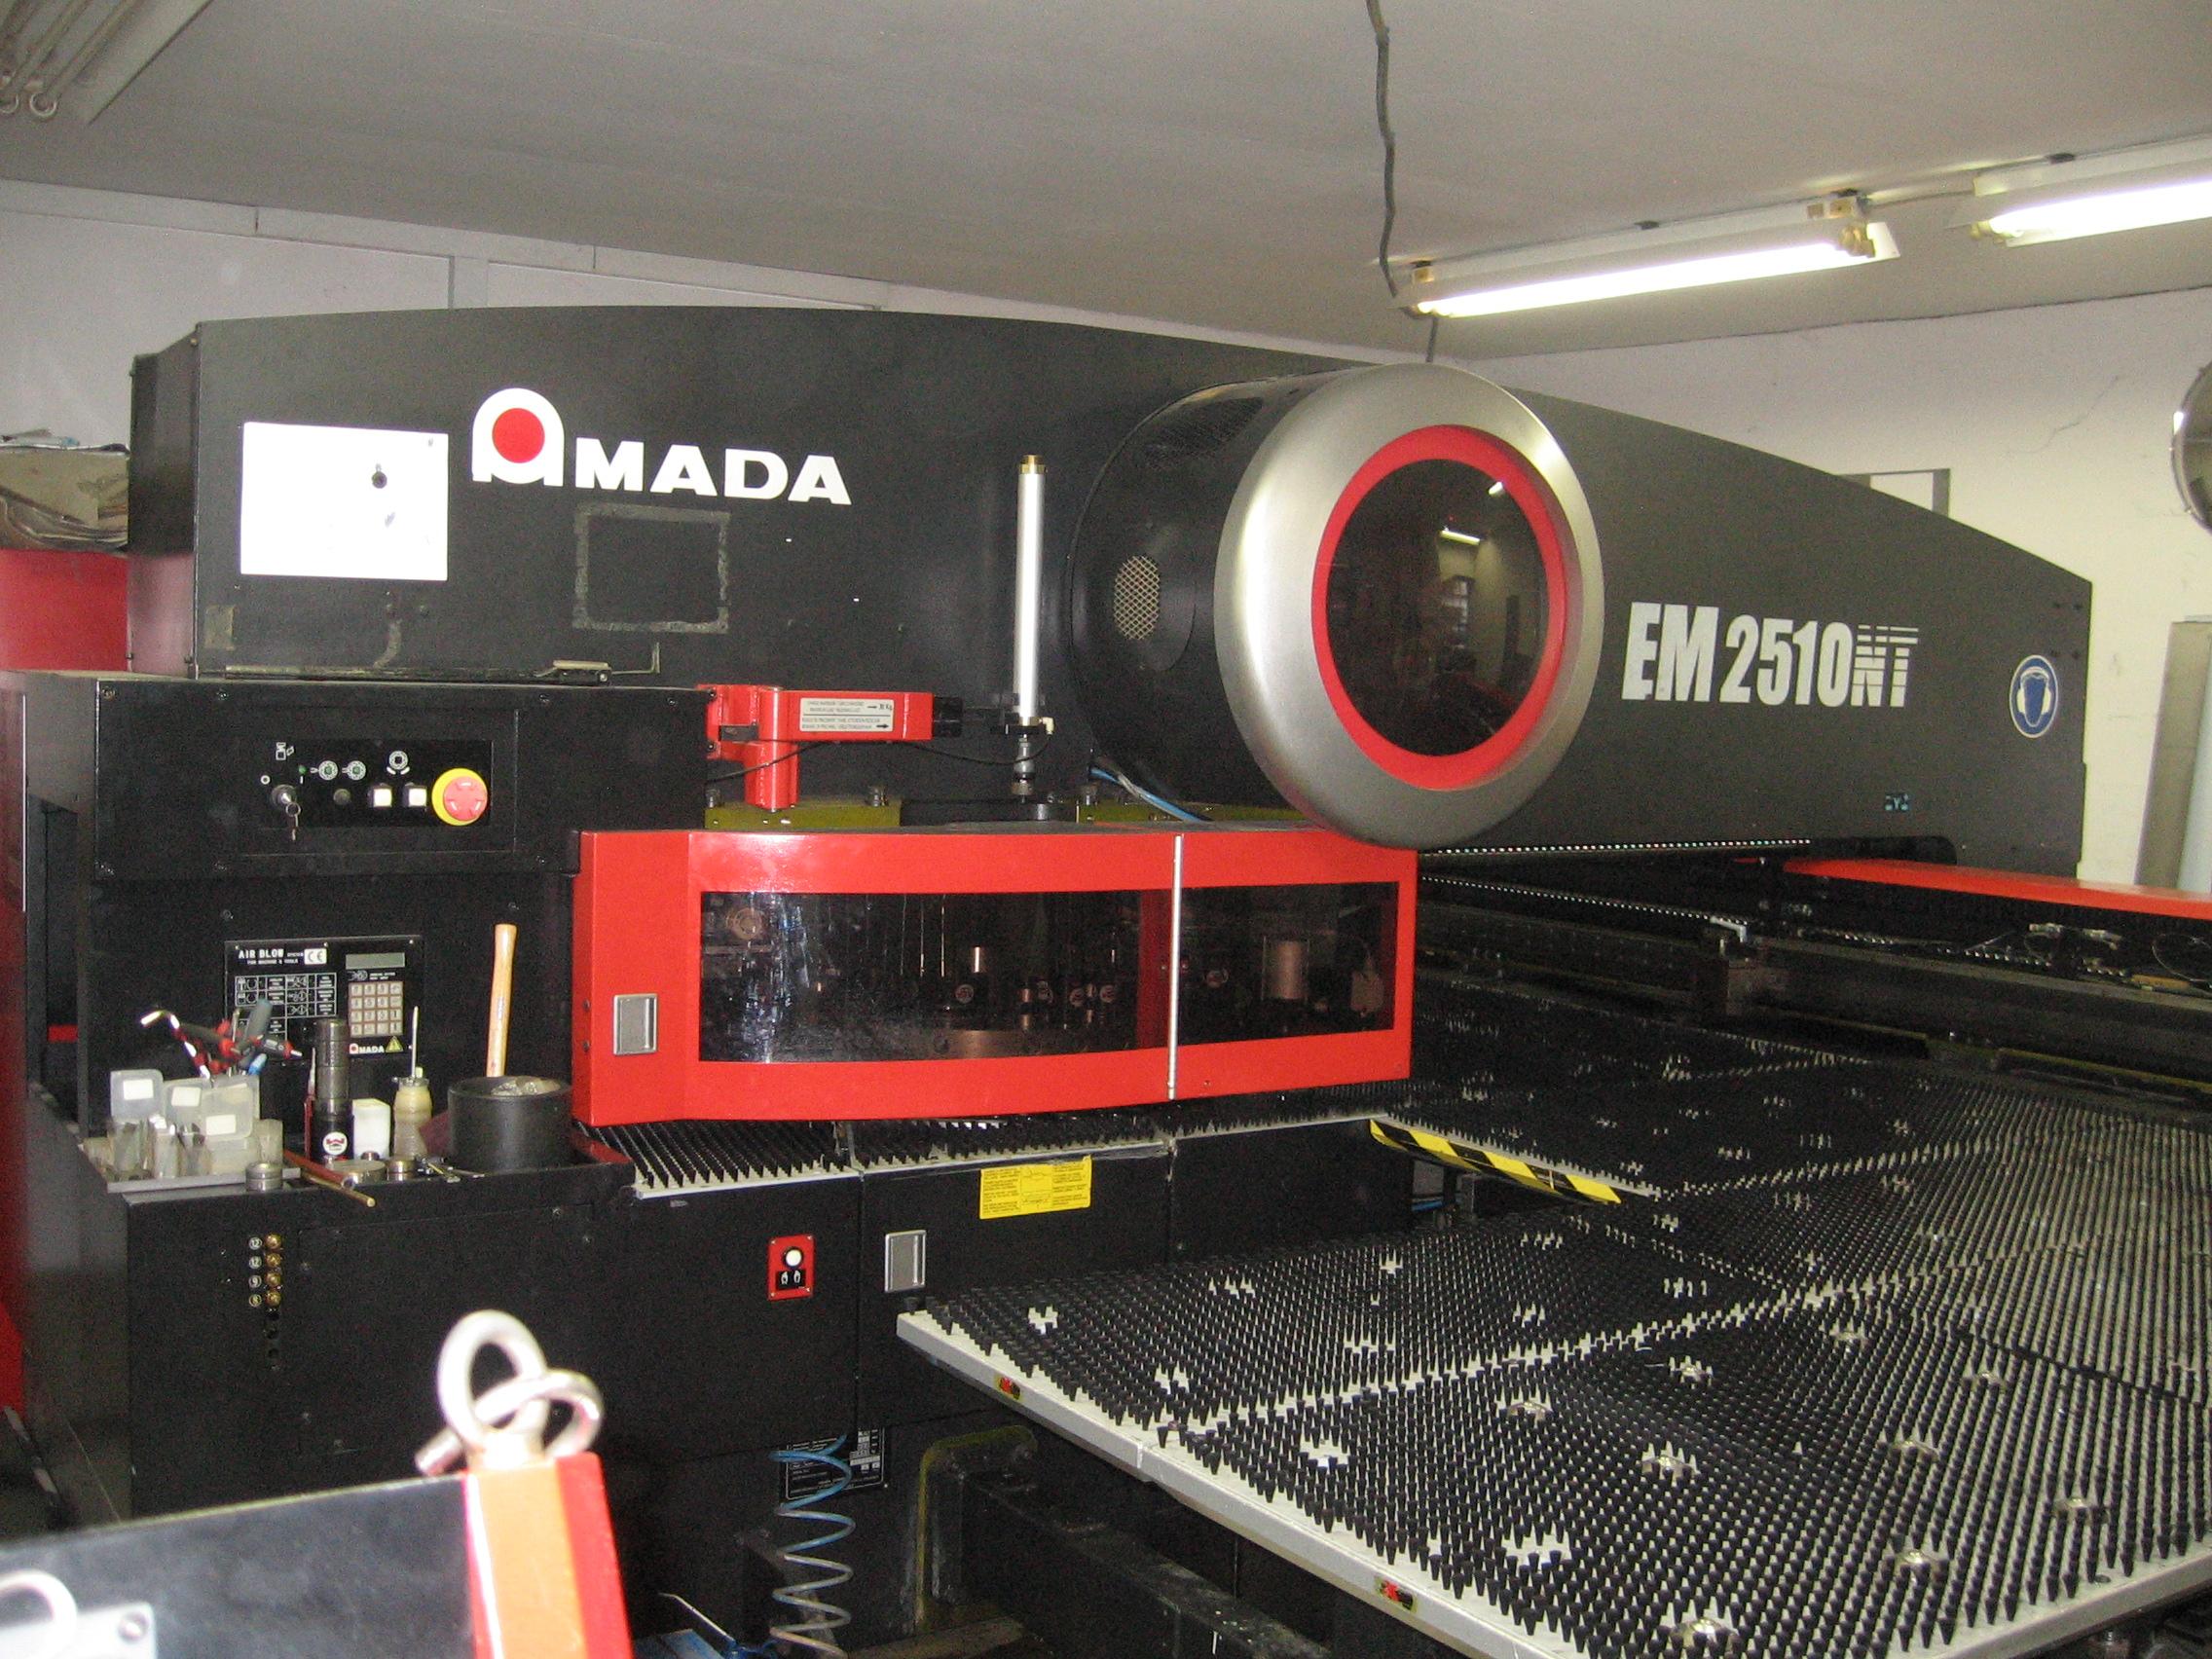 Amada Nt2510 Amada Punching Machine Nibbling Machine